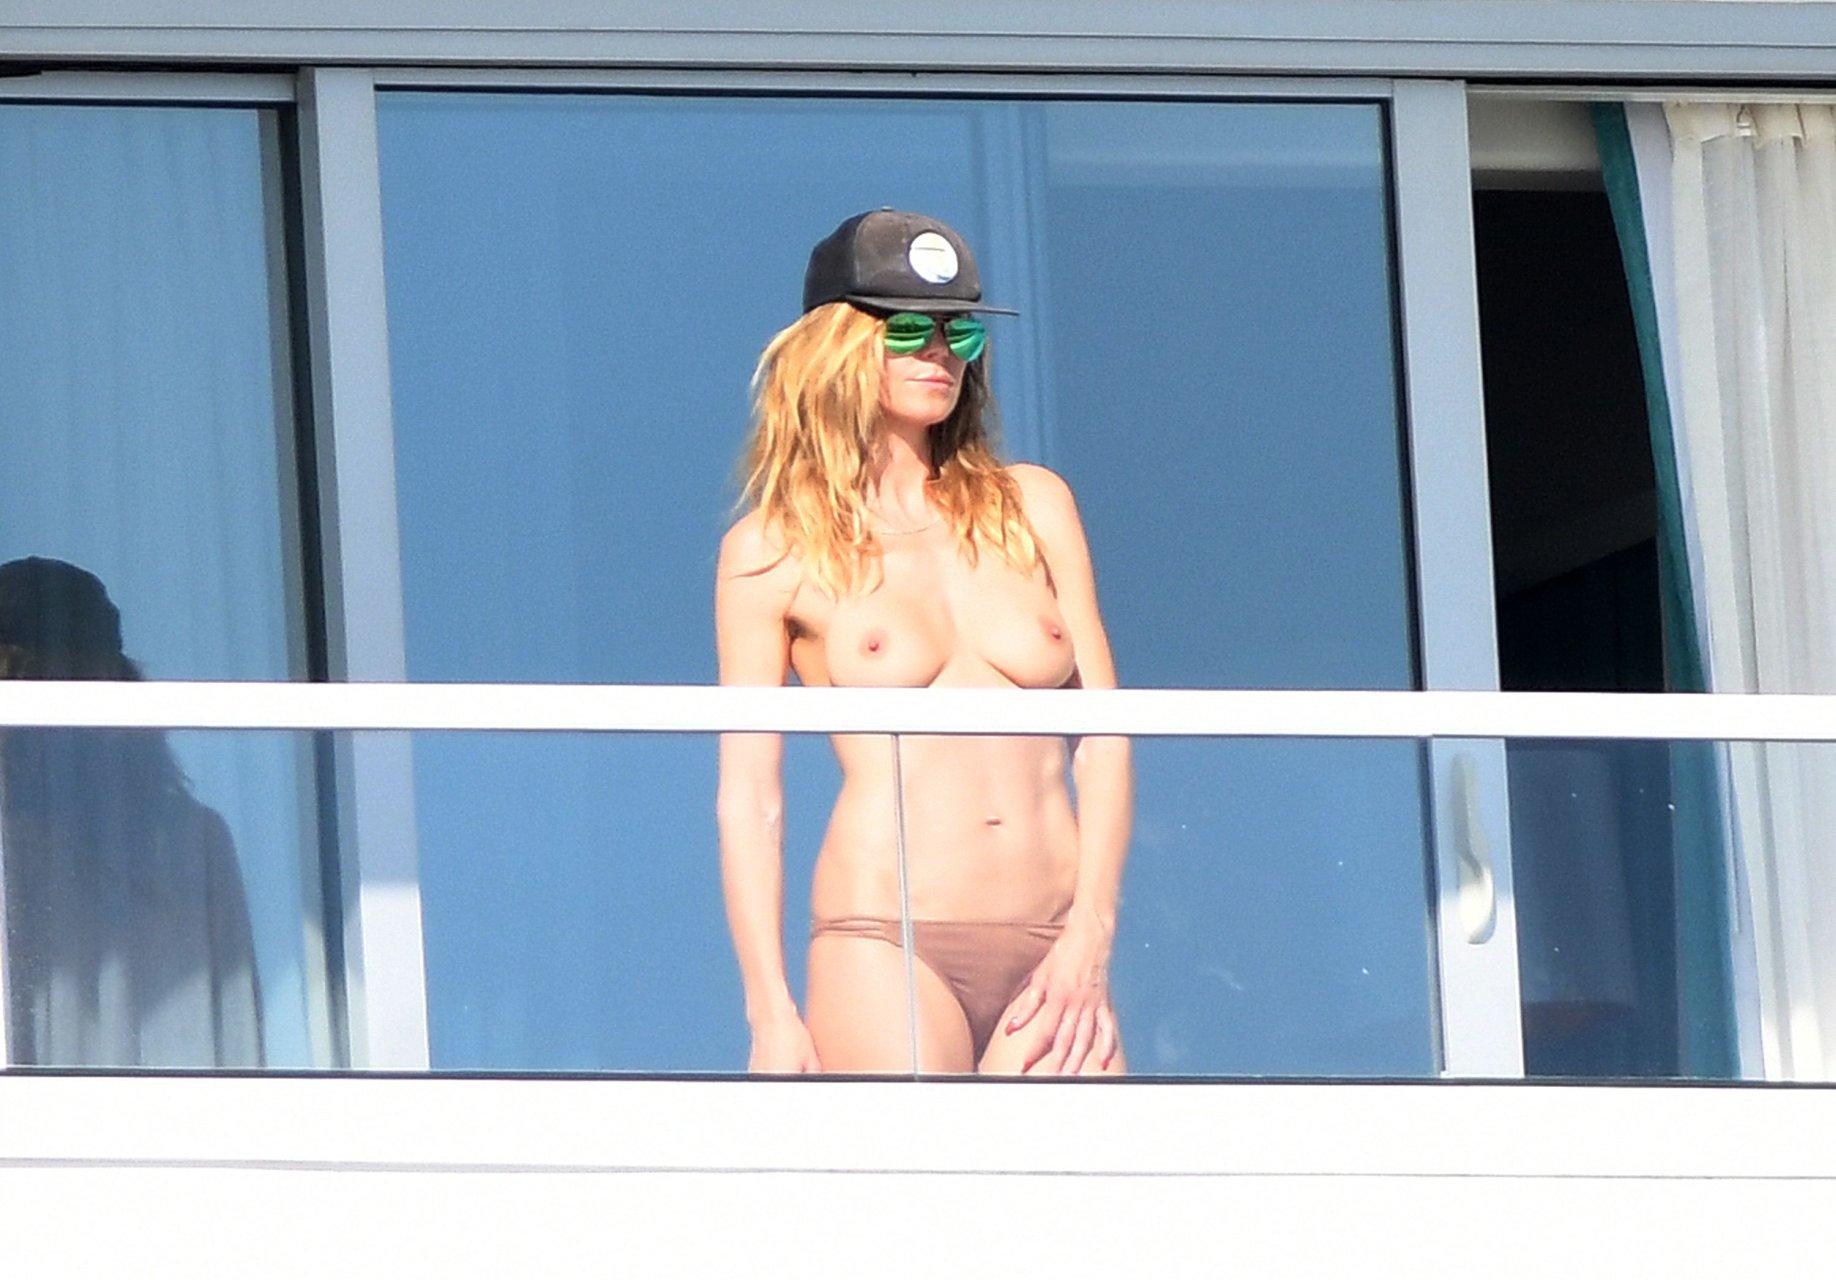 Heidi klum shows off side boob in nude vacation snapshot